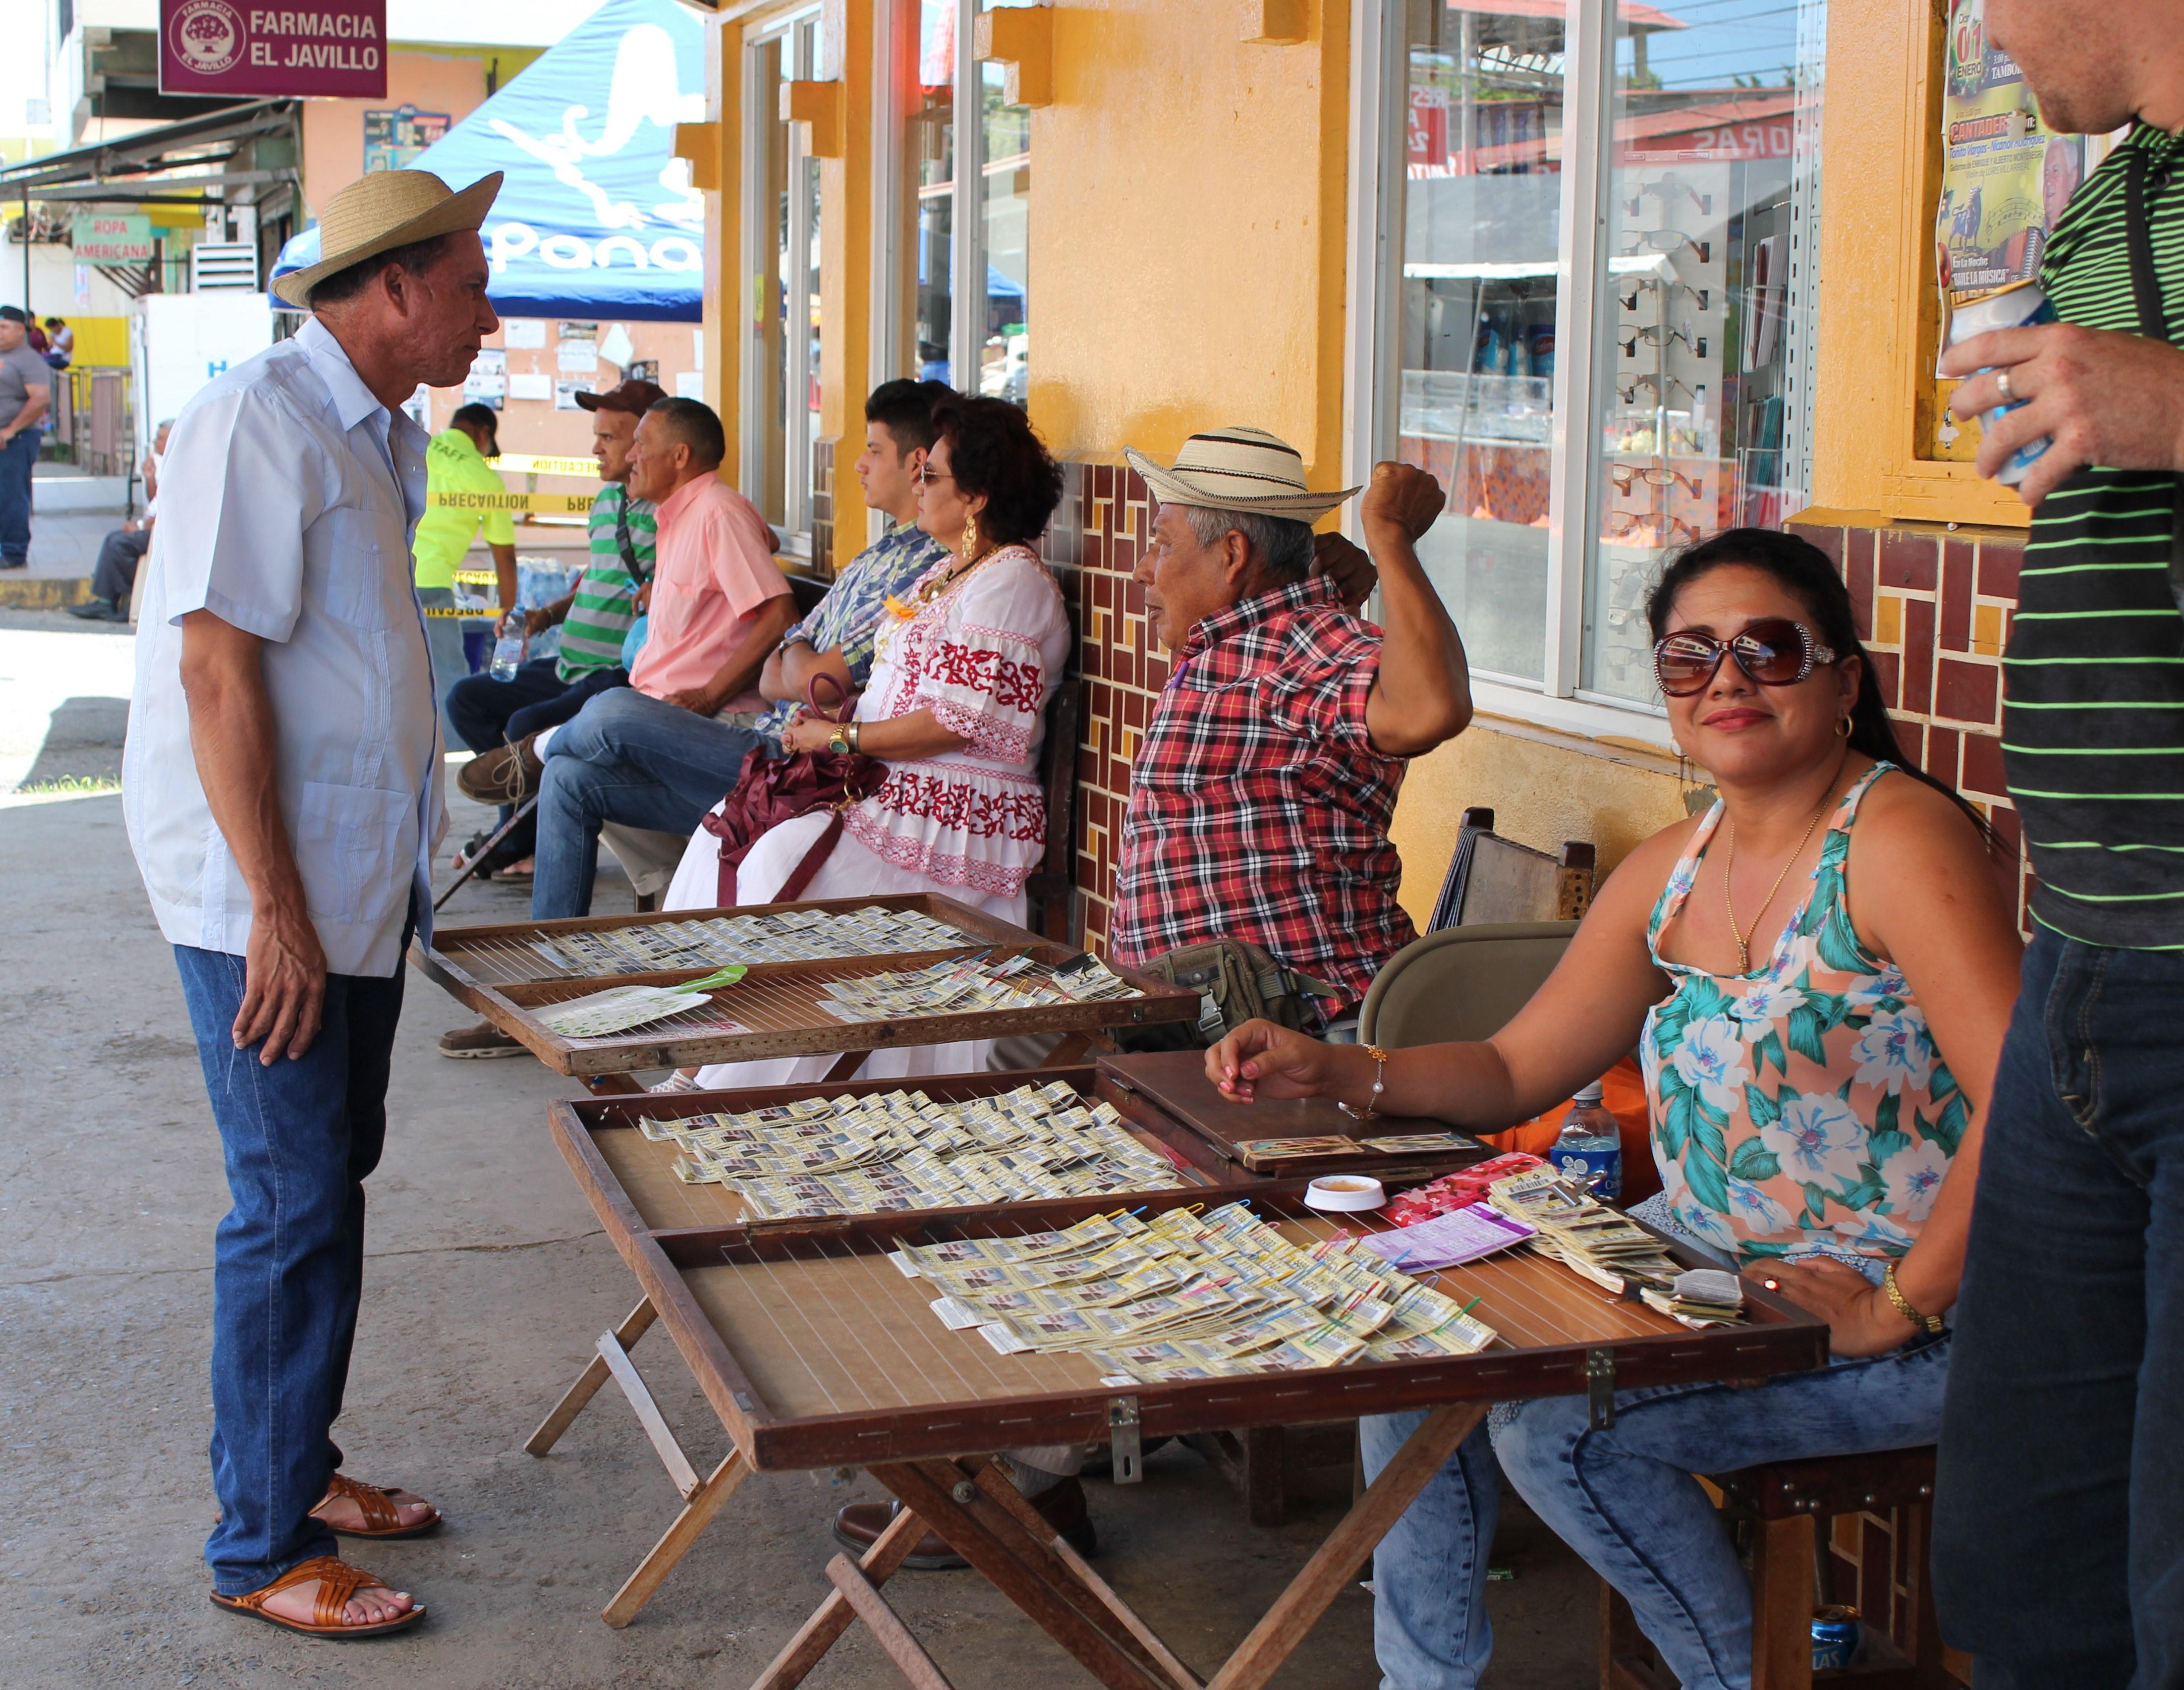 las-tablas-lottery A Panama Road Trip Panama Panama Fairs and Festivals